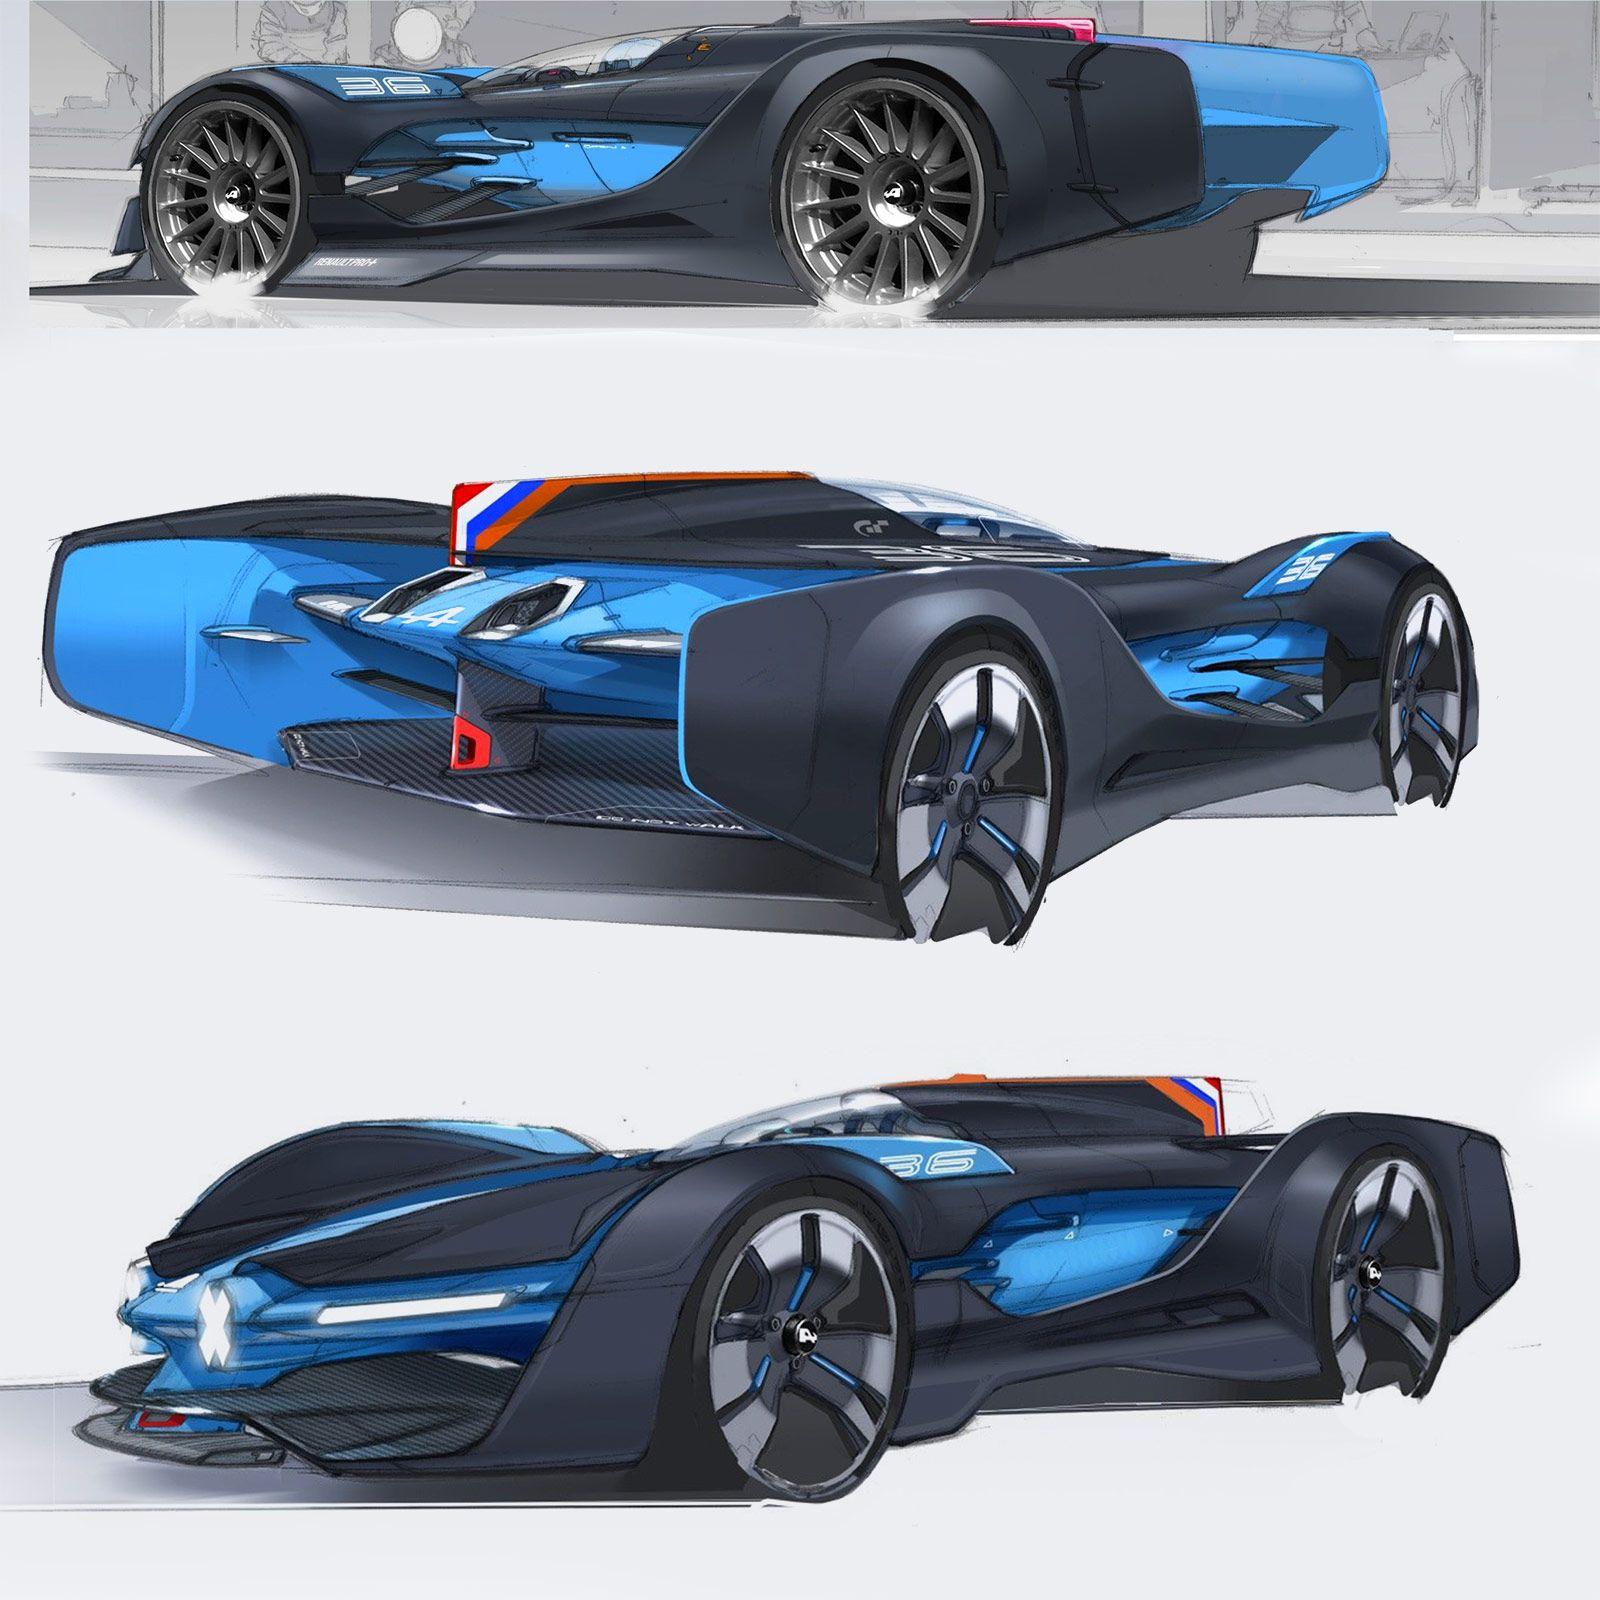 Alpine Vision Gran Turismo Concept Design Sketches By